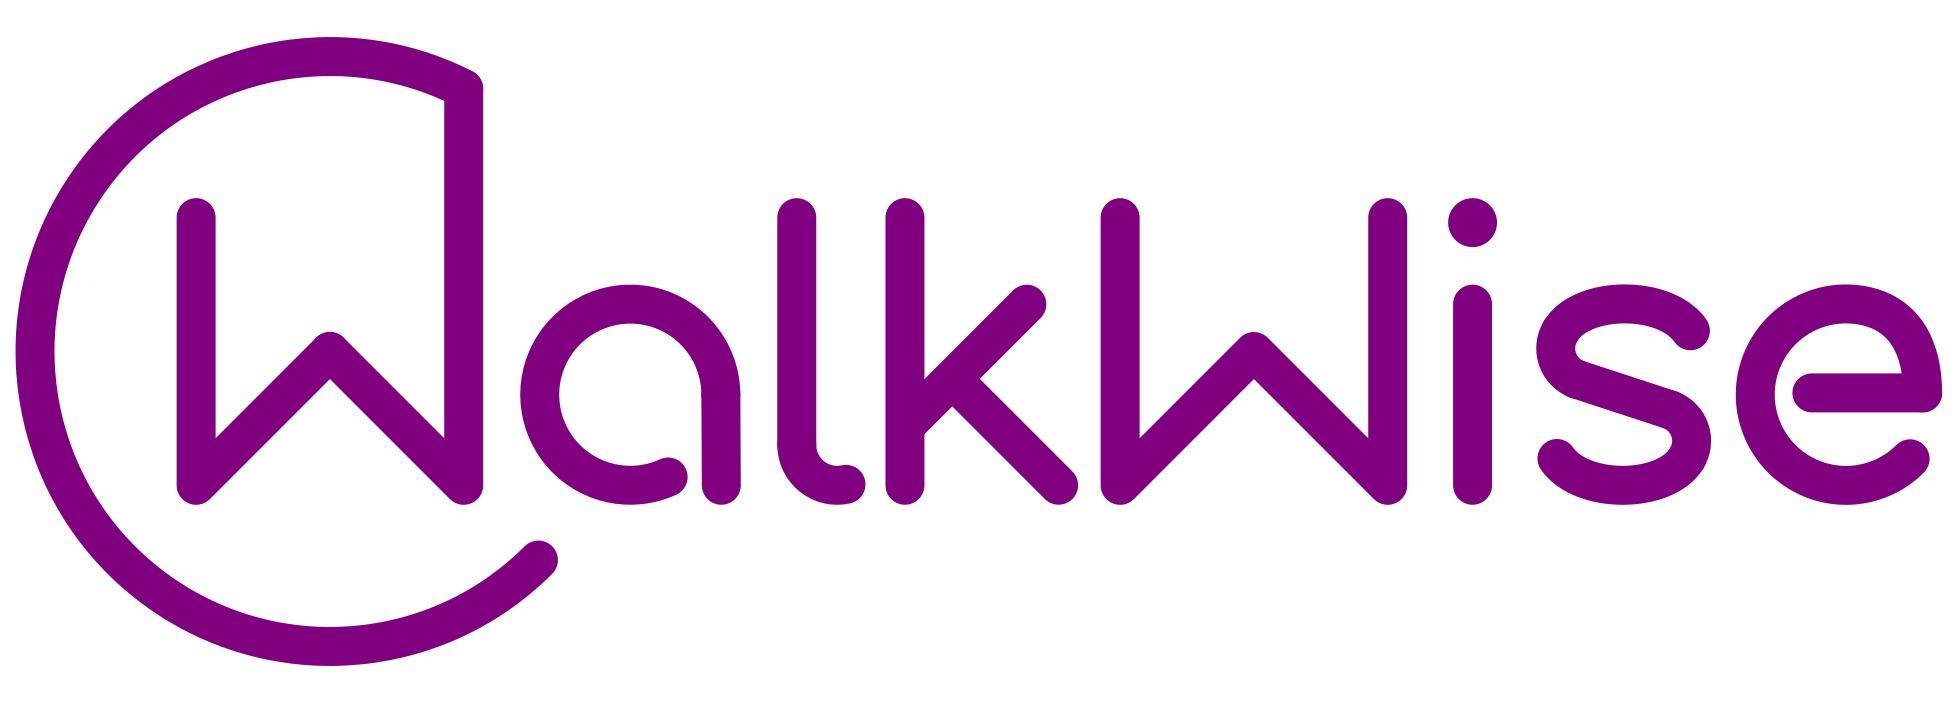 WalkWise+Transparent+Background+Border.jpg